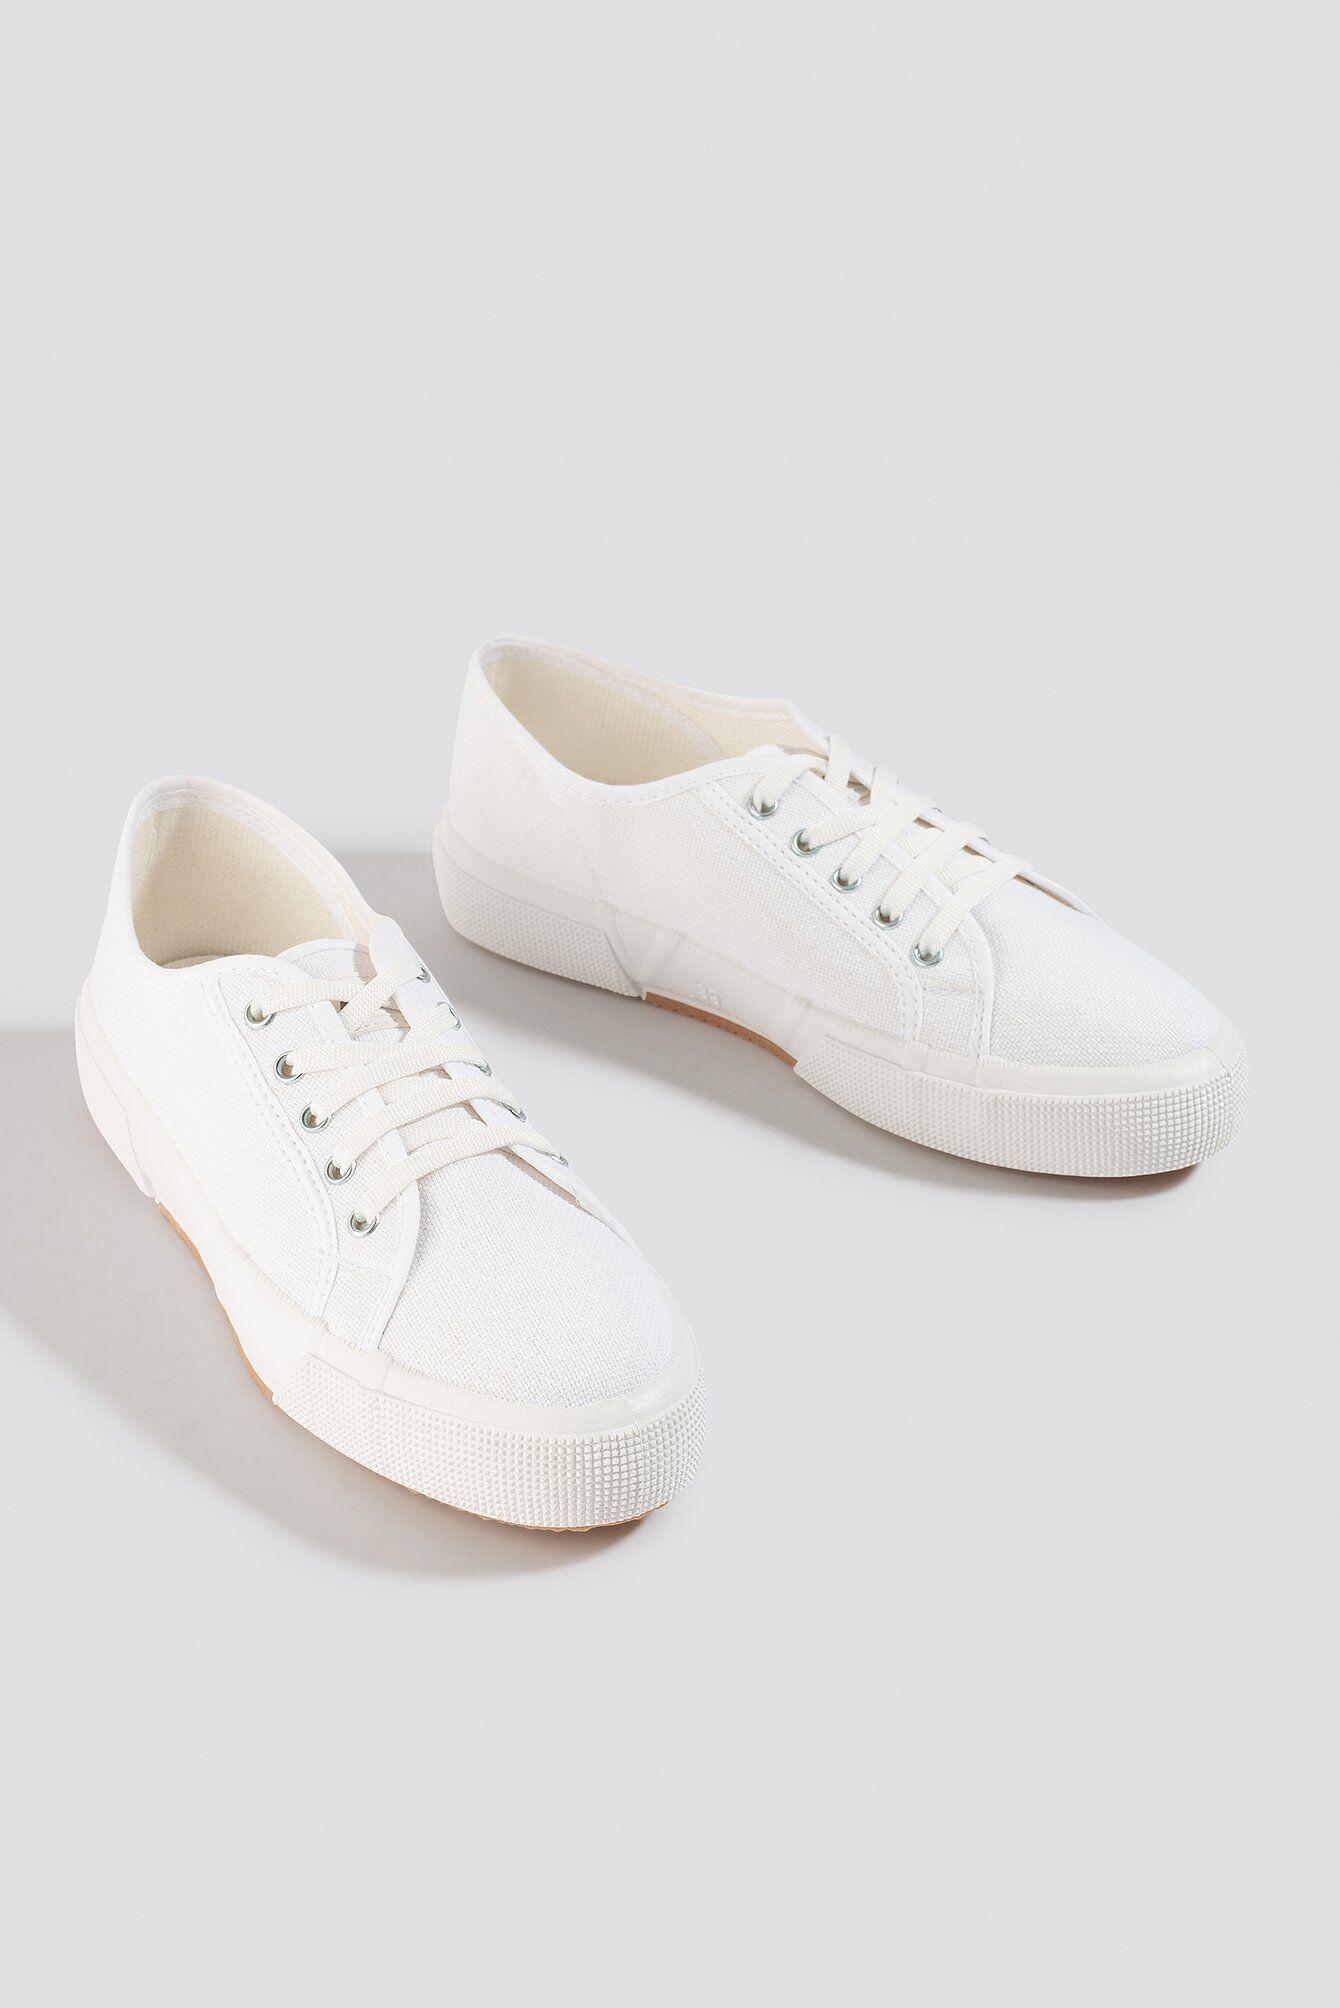 NA-KD Shoes Basic Canvas Sneakers - White  - Size: EU 36,EU 37,EU 38,EU 39,EU 40,EU 41